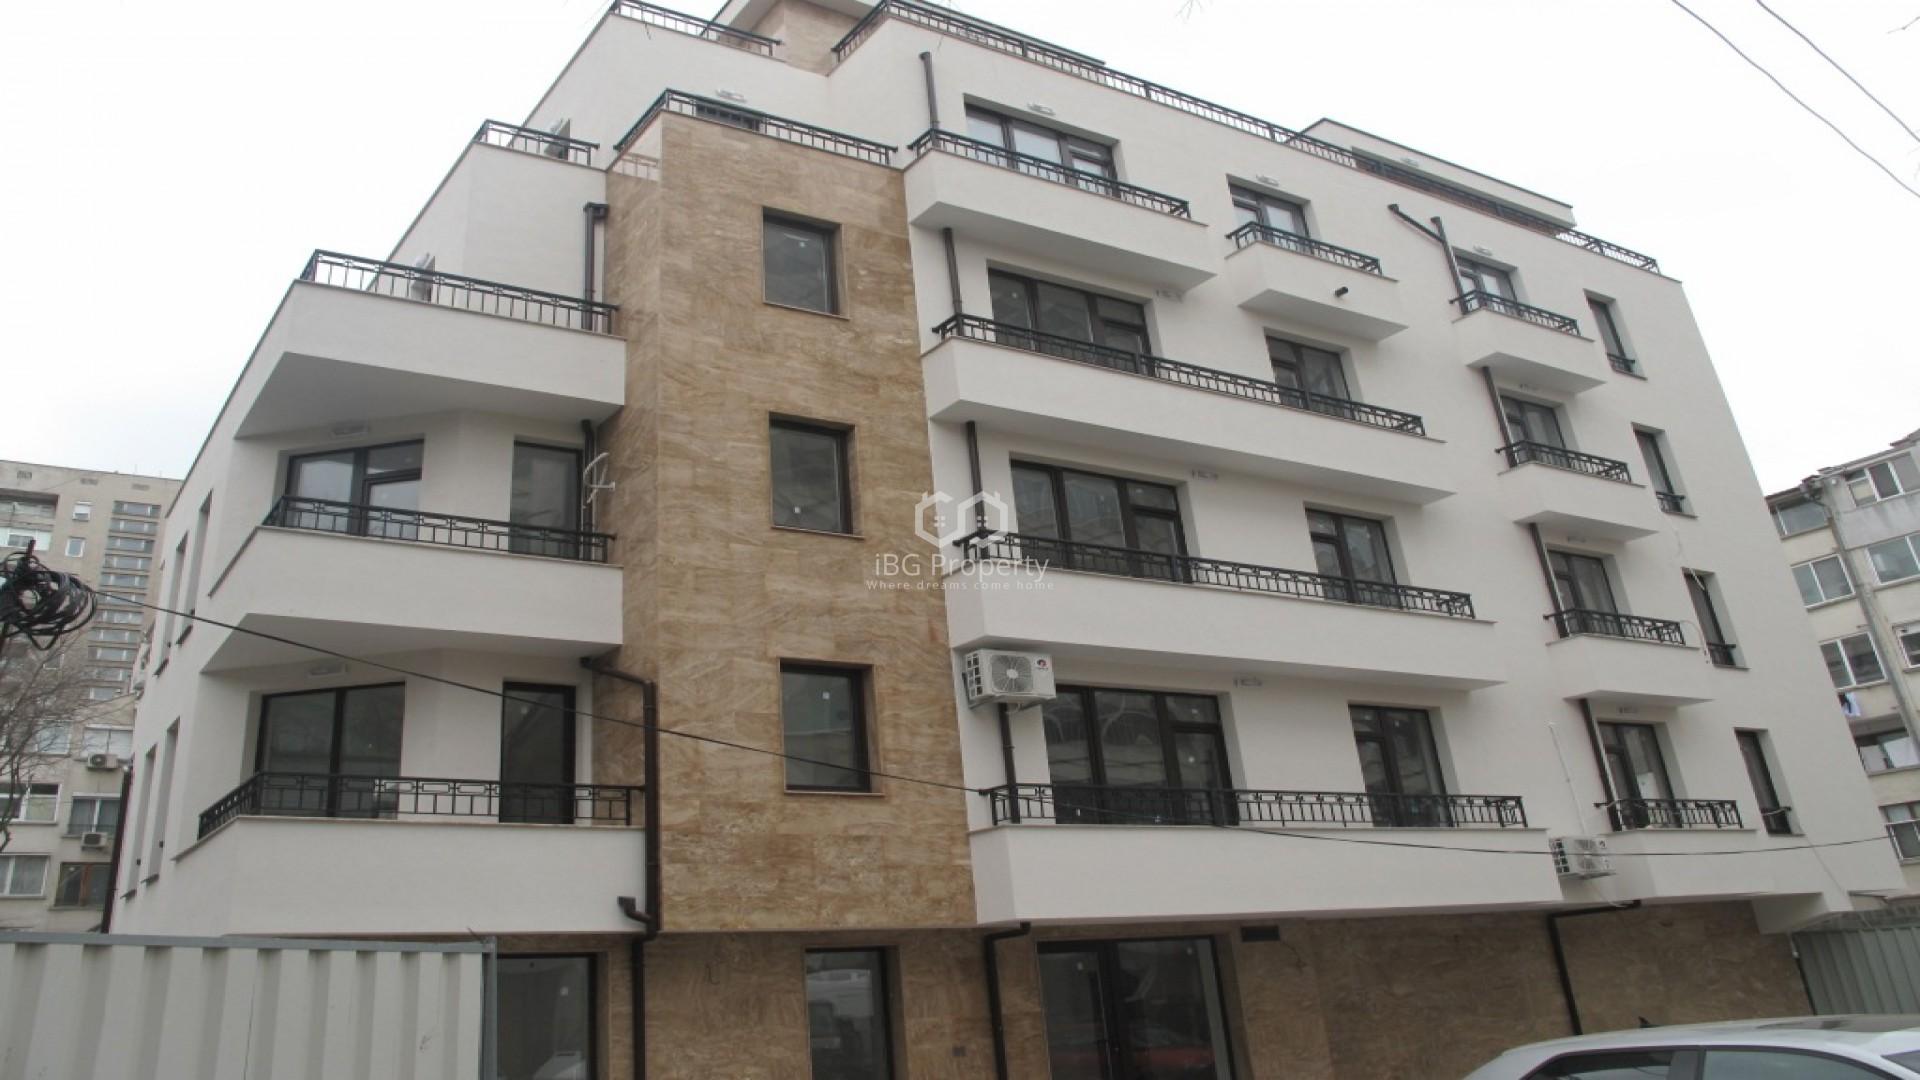 Двухкомнатная квартира Център Бургас  109 m2